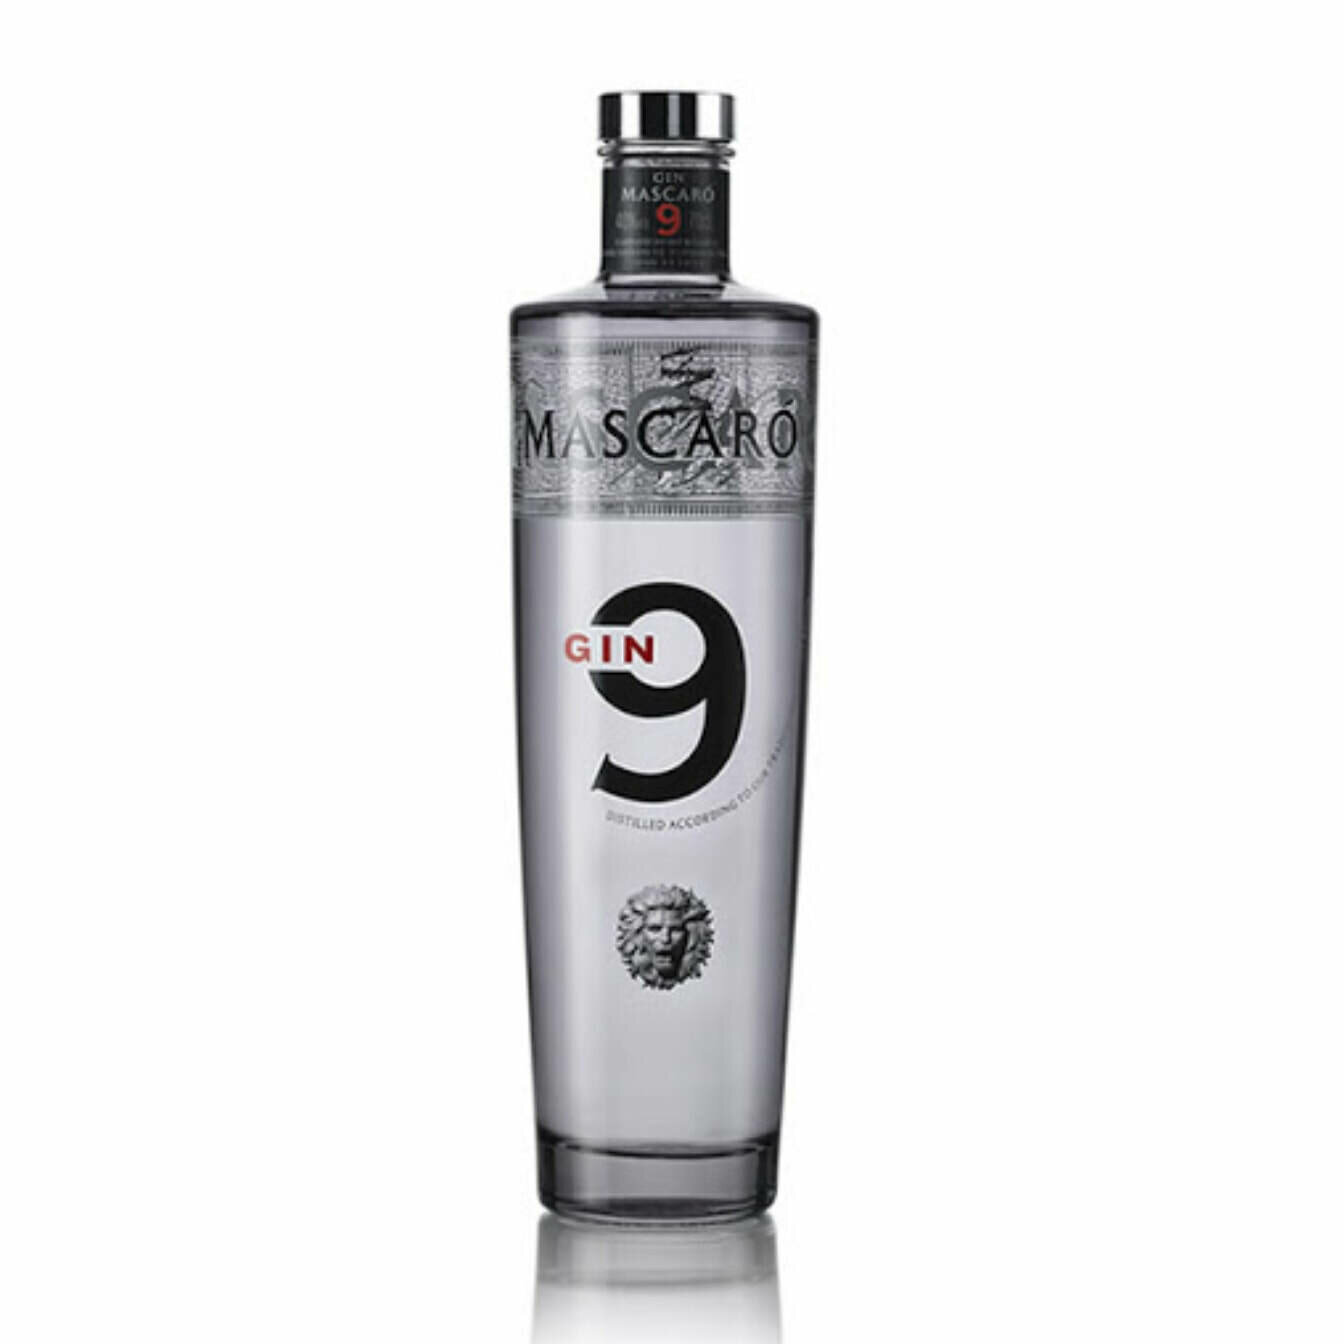 Mascaro 9 Gin